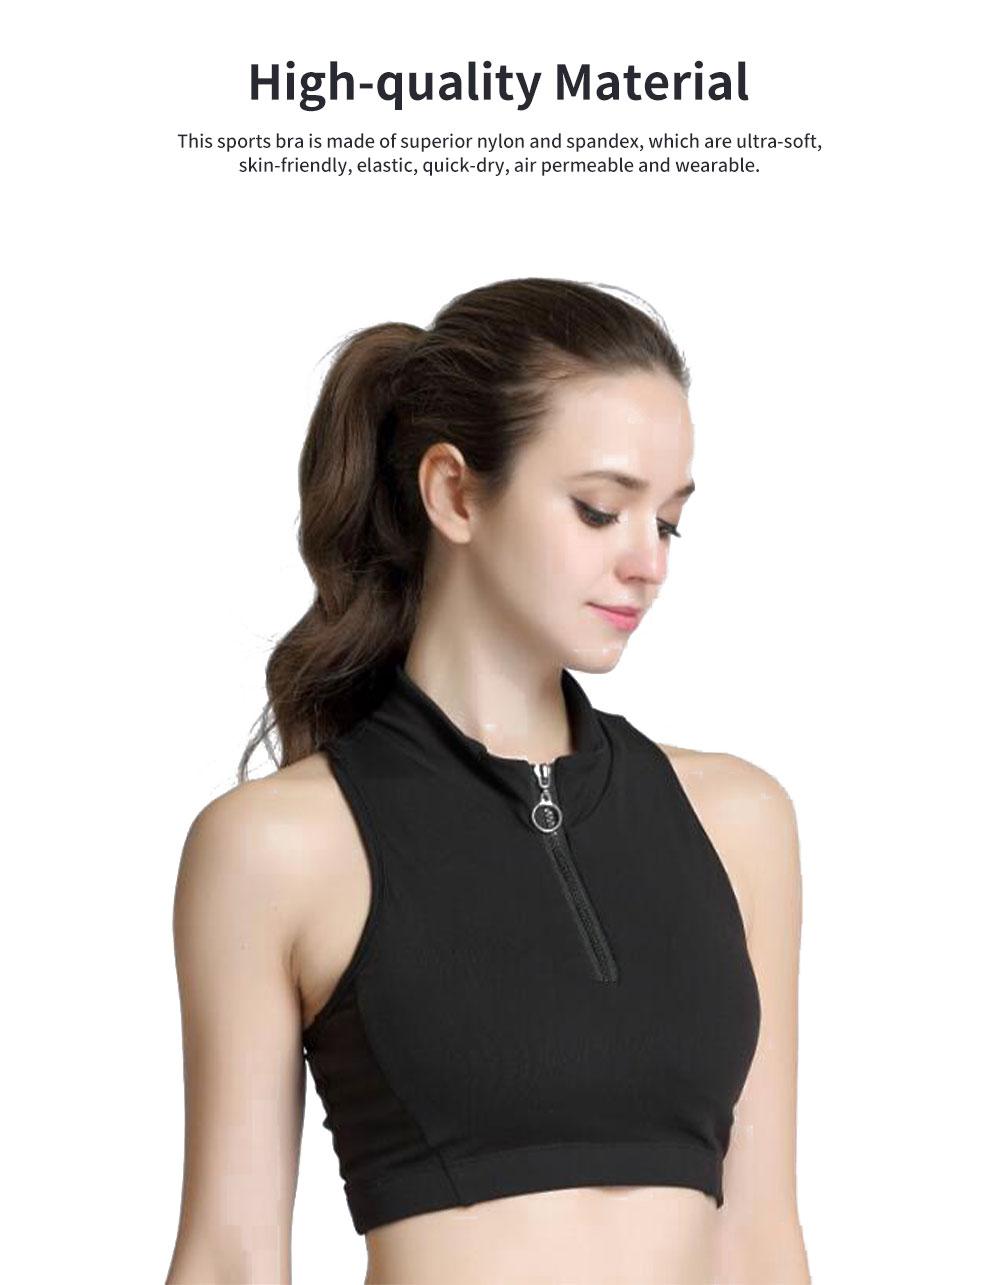 Minimalist High Collar Zipper Yoga Sports Bra for Ladies Fashion Comfortable Quick-dry Athletic Undergarment 1